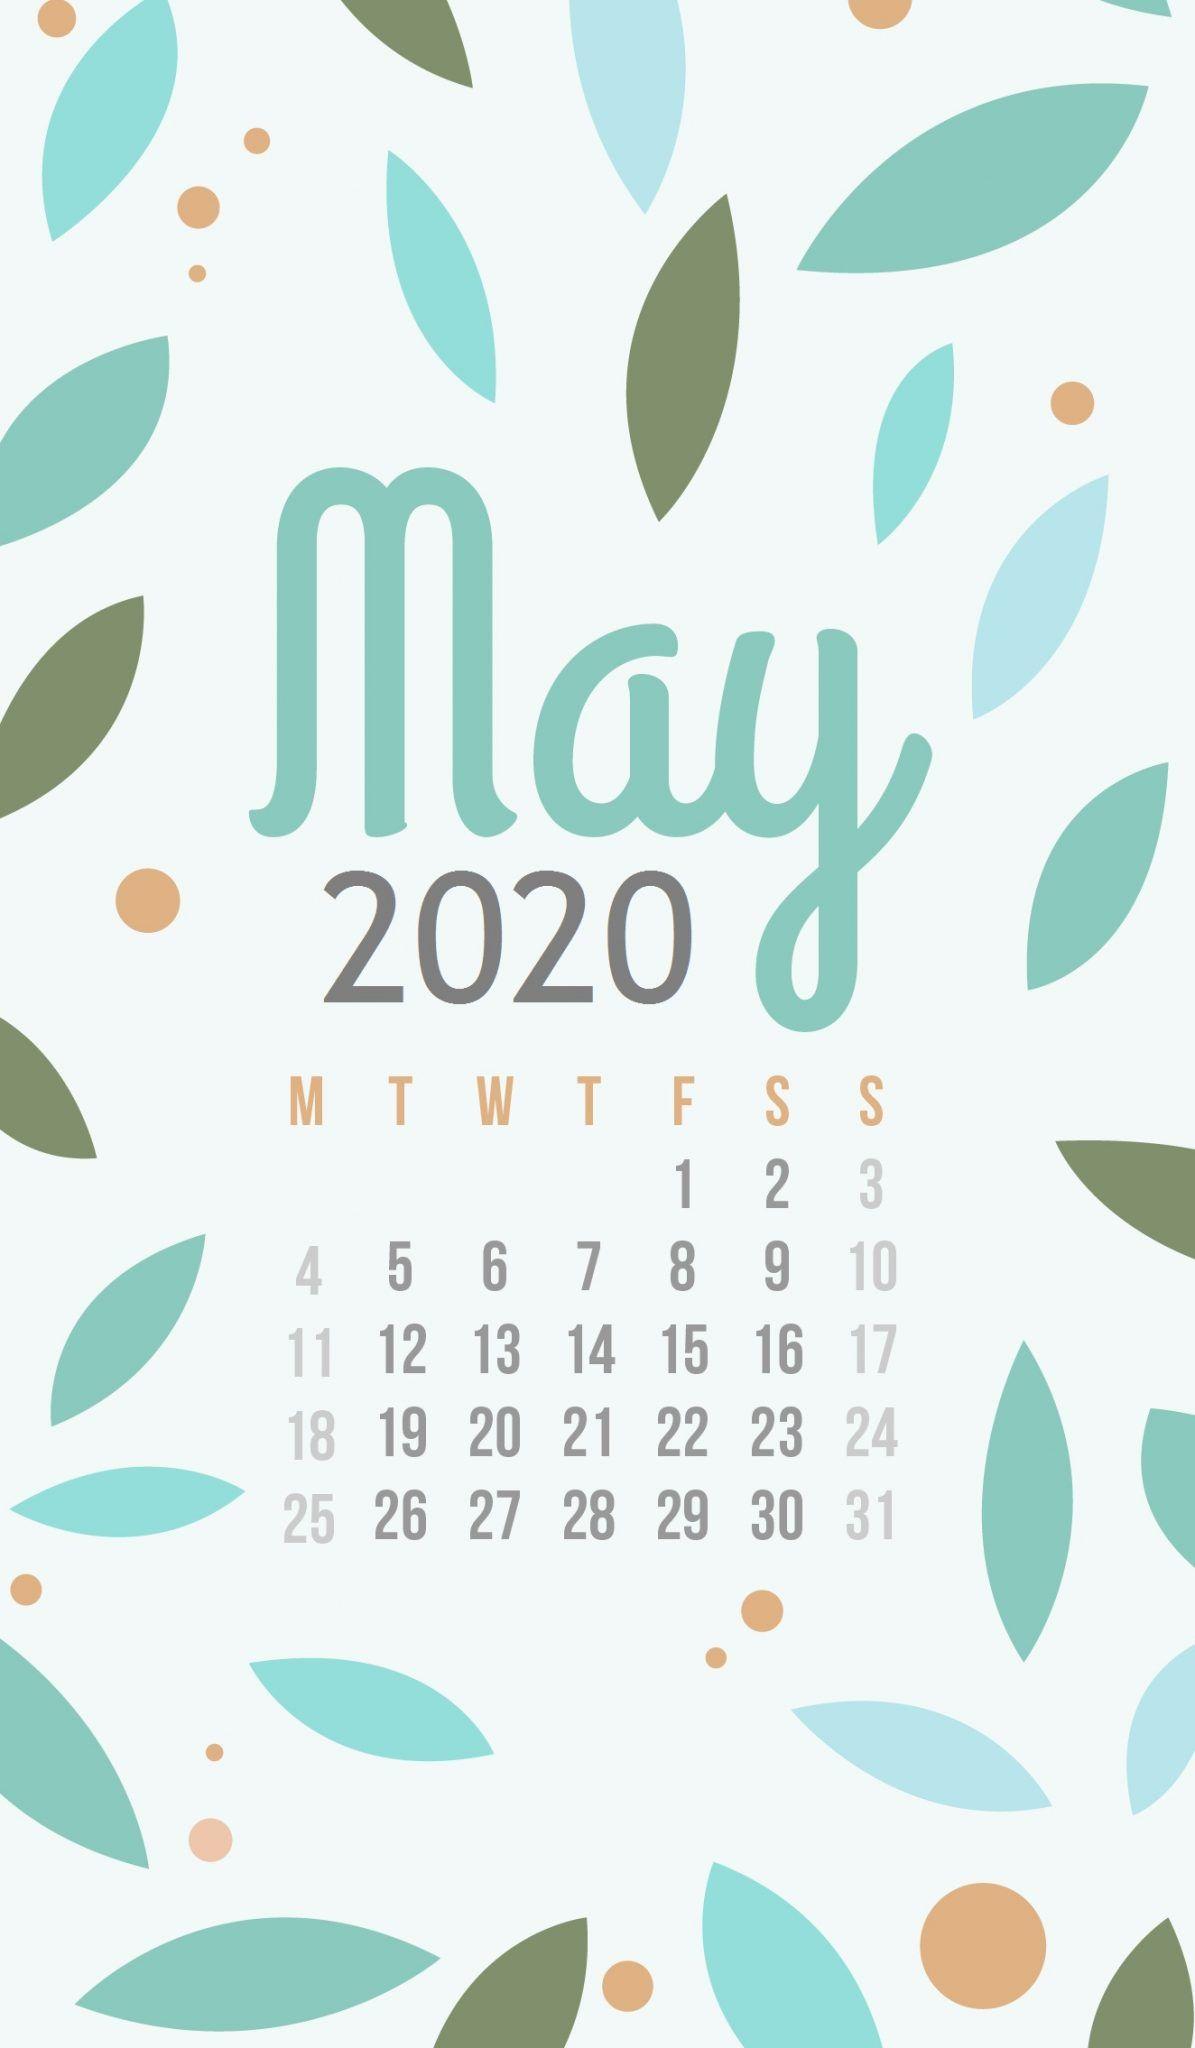 Cute Iphone May 2020 Wallpaper In 2020